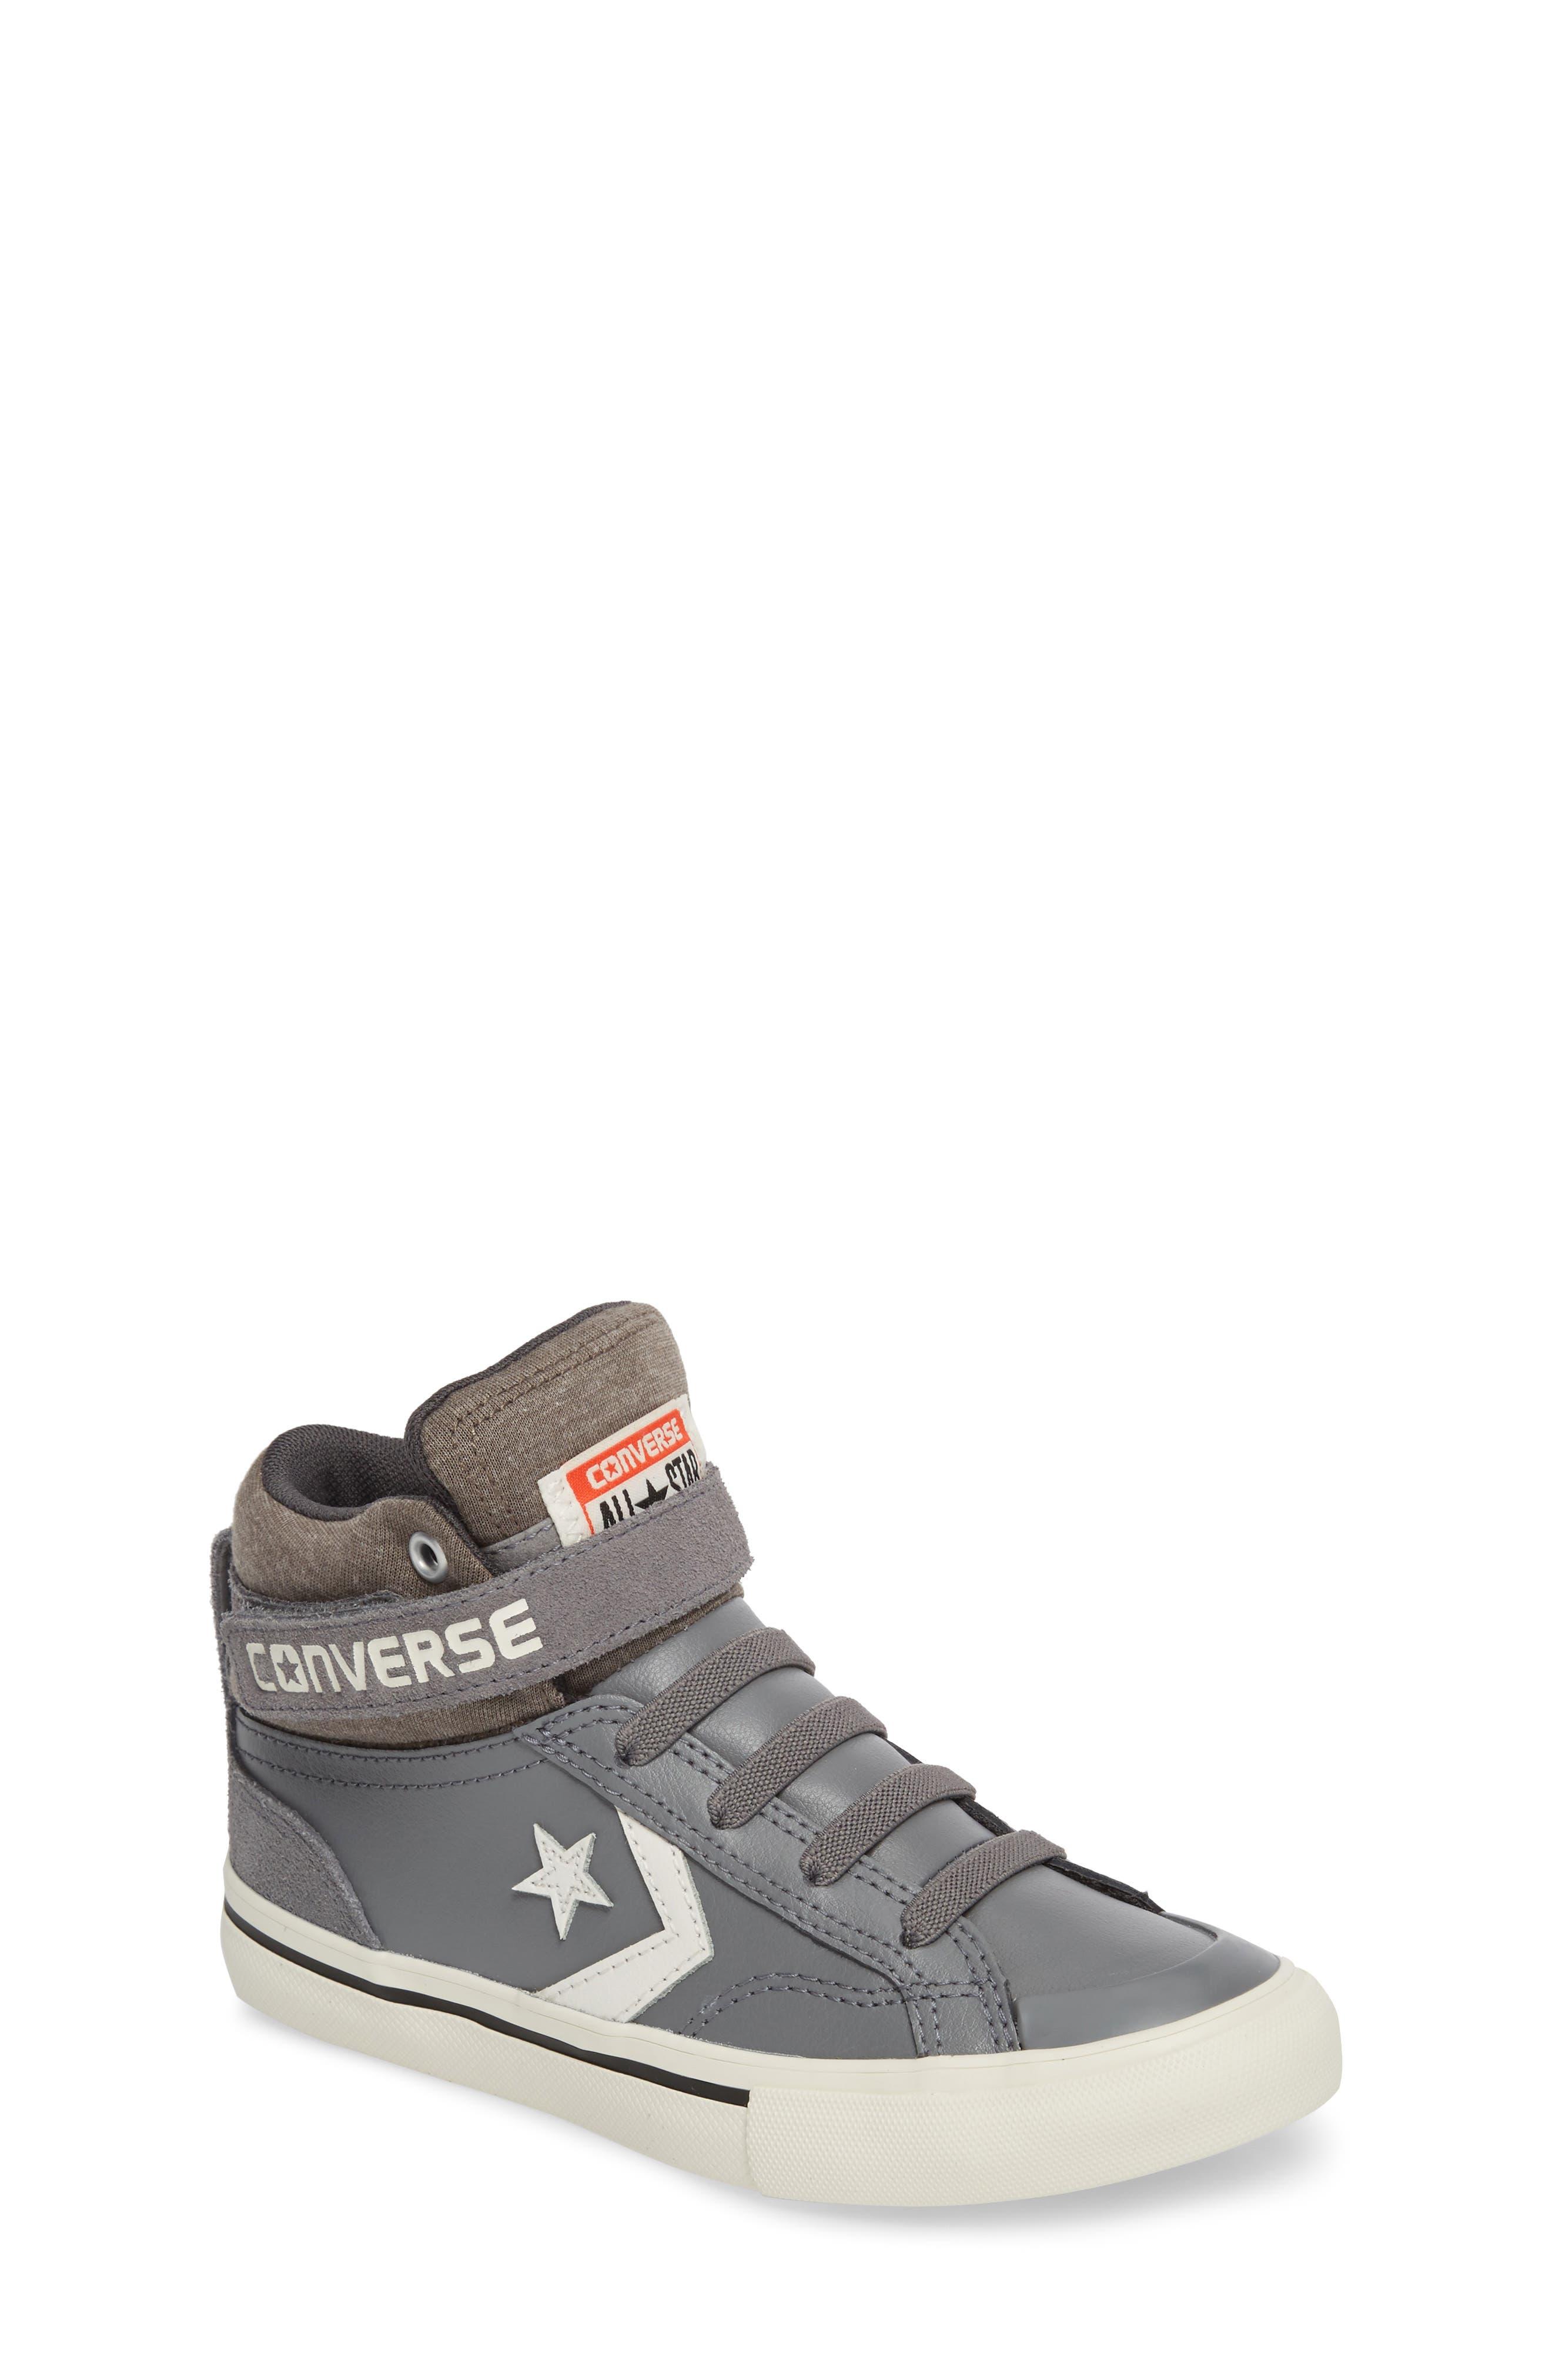 Pro Blaze High Top Sneaker,                             Main thumbnail 1, color,                             Mason Leather